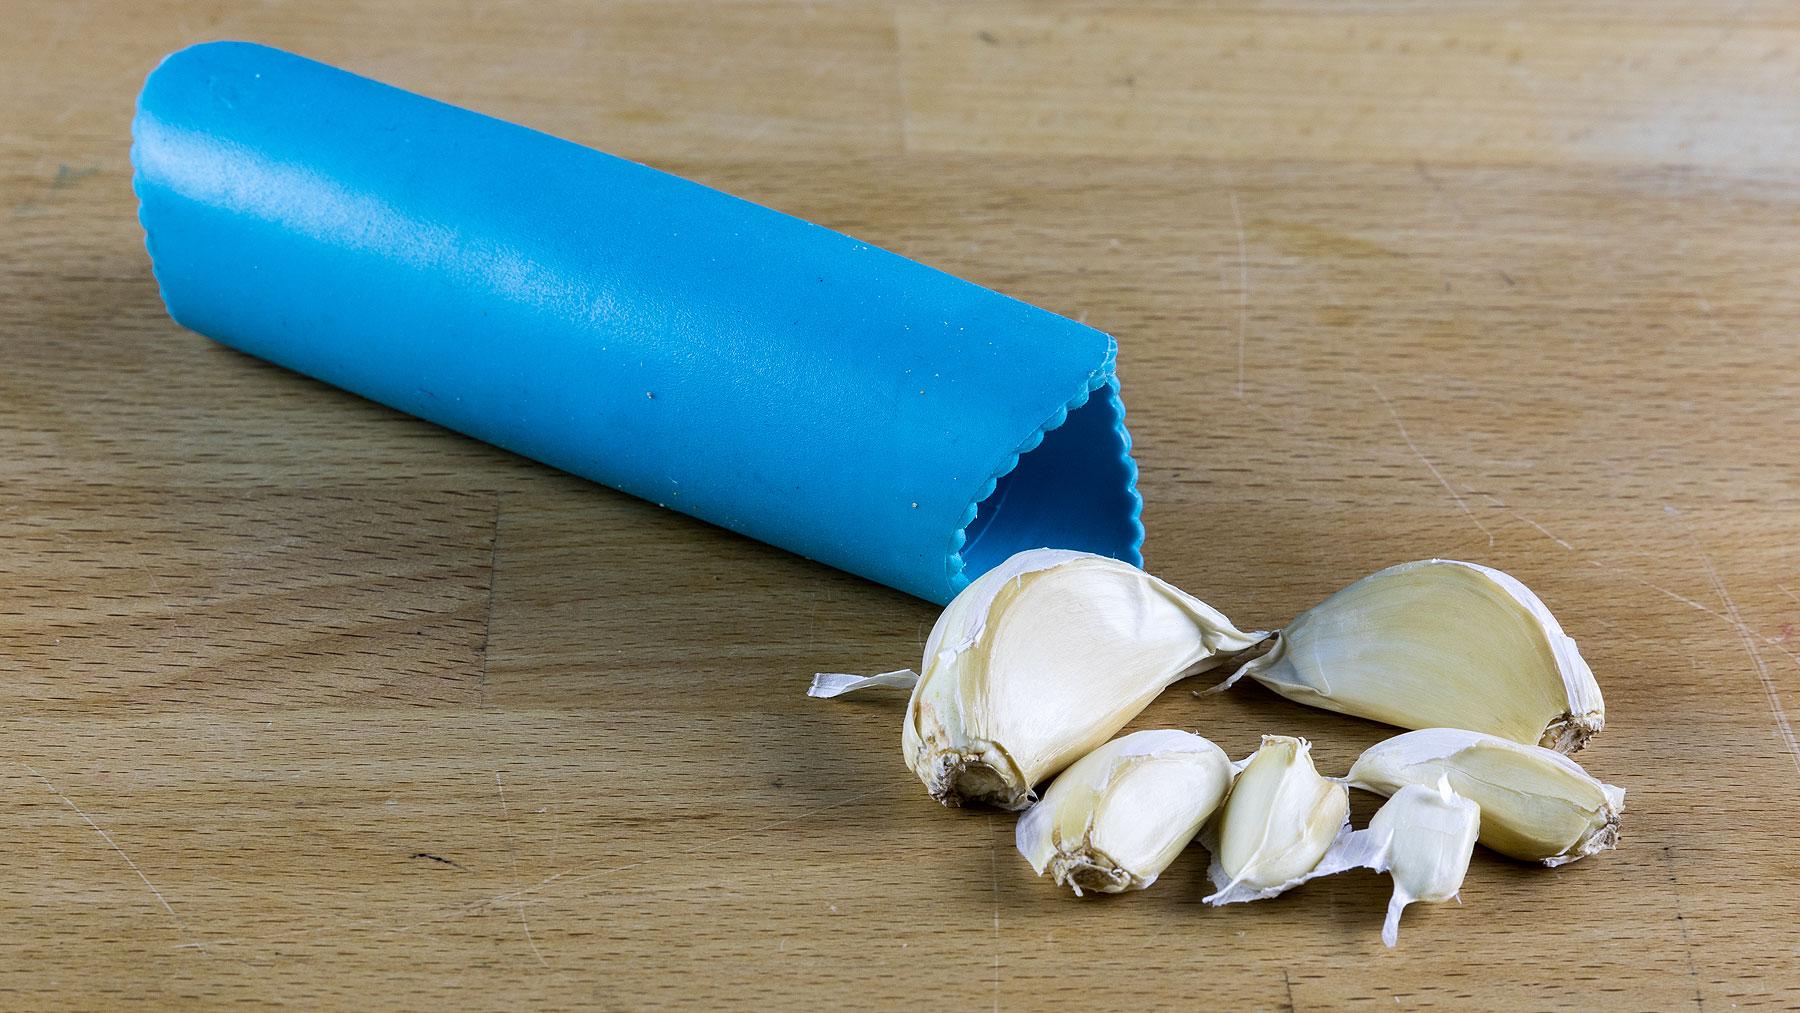 Garlic peeler with garlic cloves